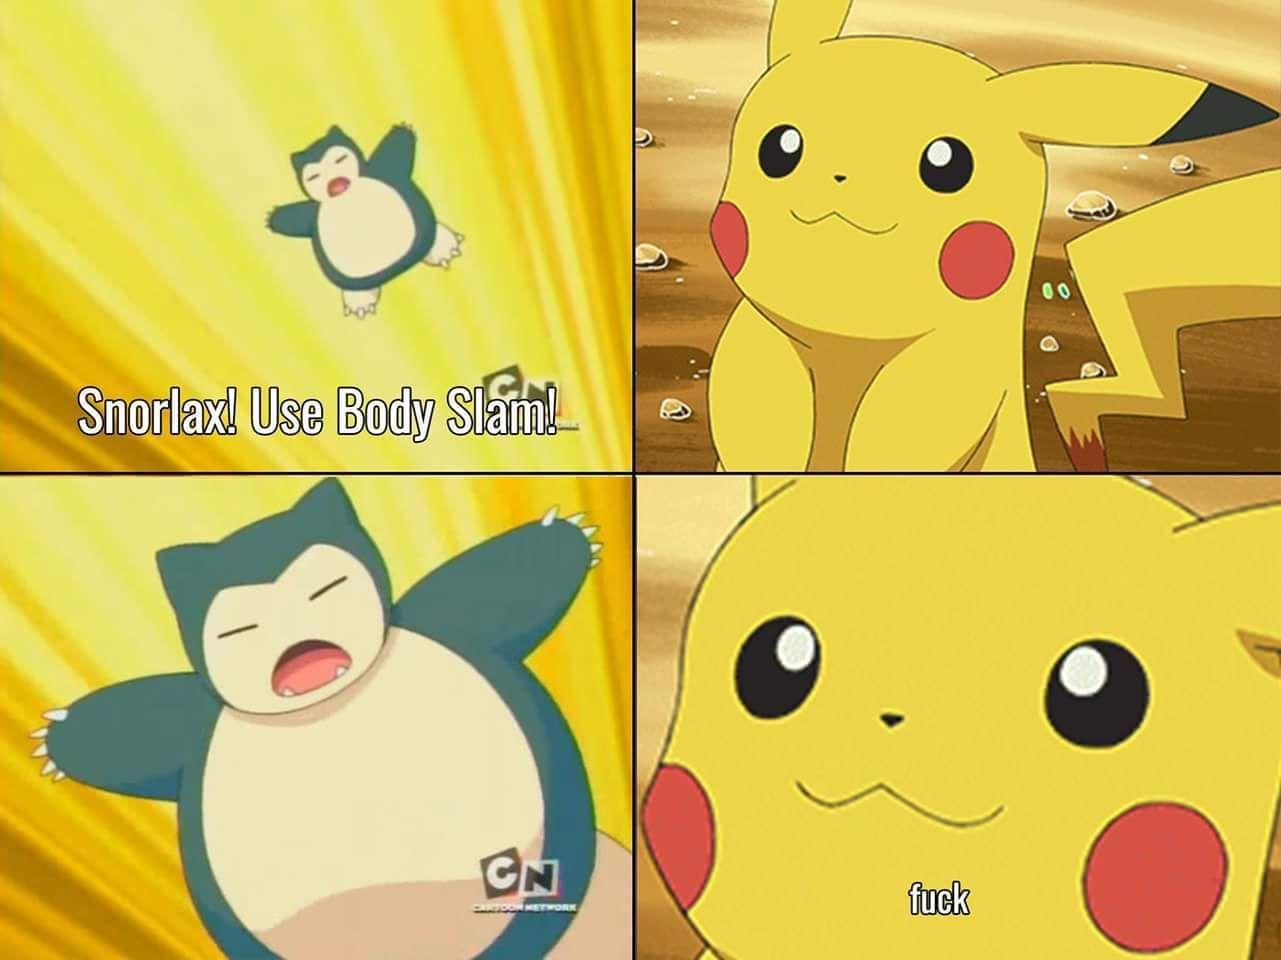 """Alright Pikachu, I choose you!"""